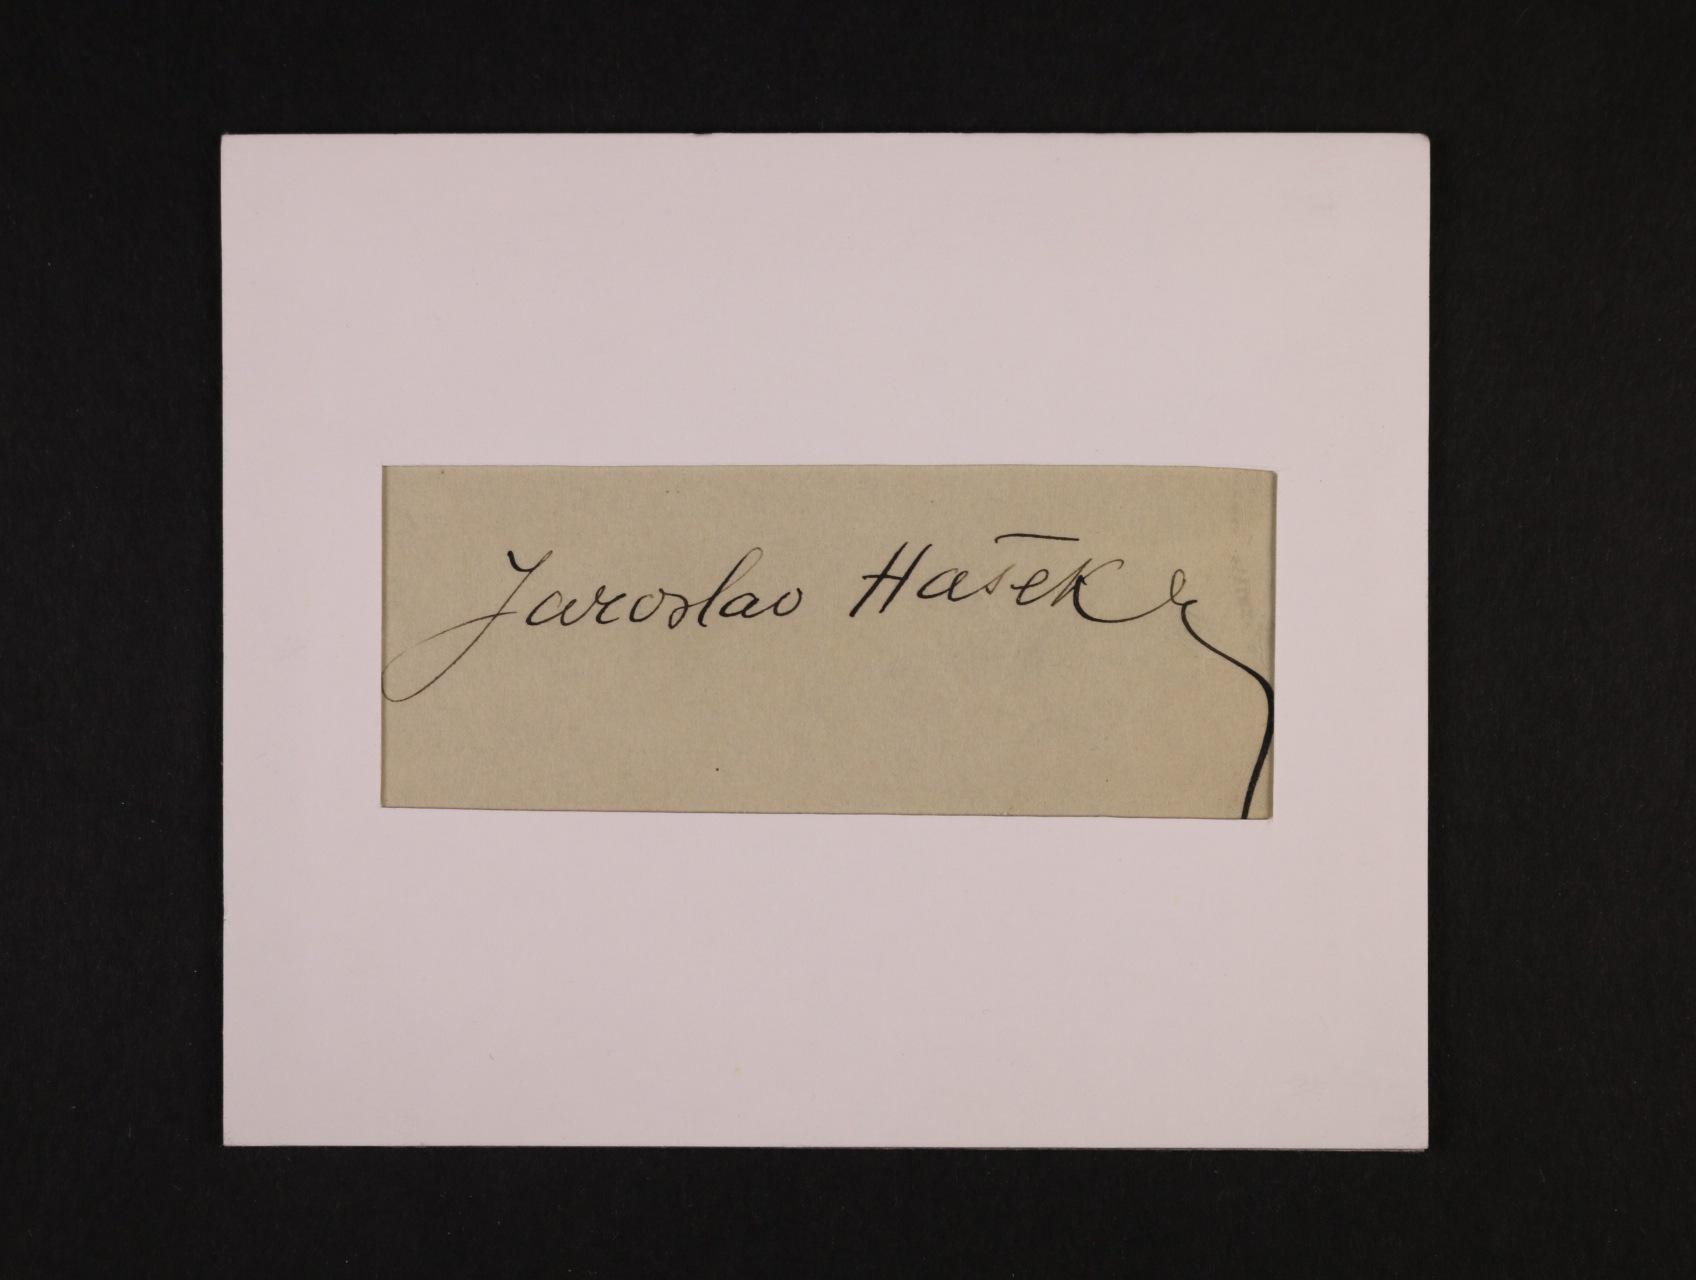 Hašek Jaroslav 1883 - 1923, význačný čs. spisovatel, autor knihy Dobrý voják Švejk - ústřižek papíru s vlastnoručním podpisem